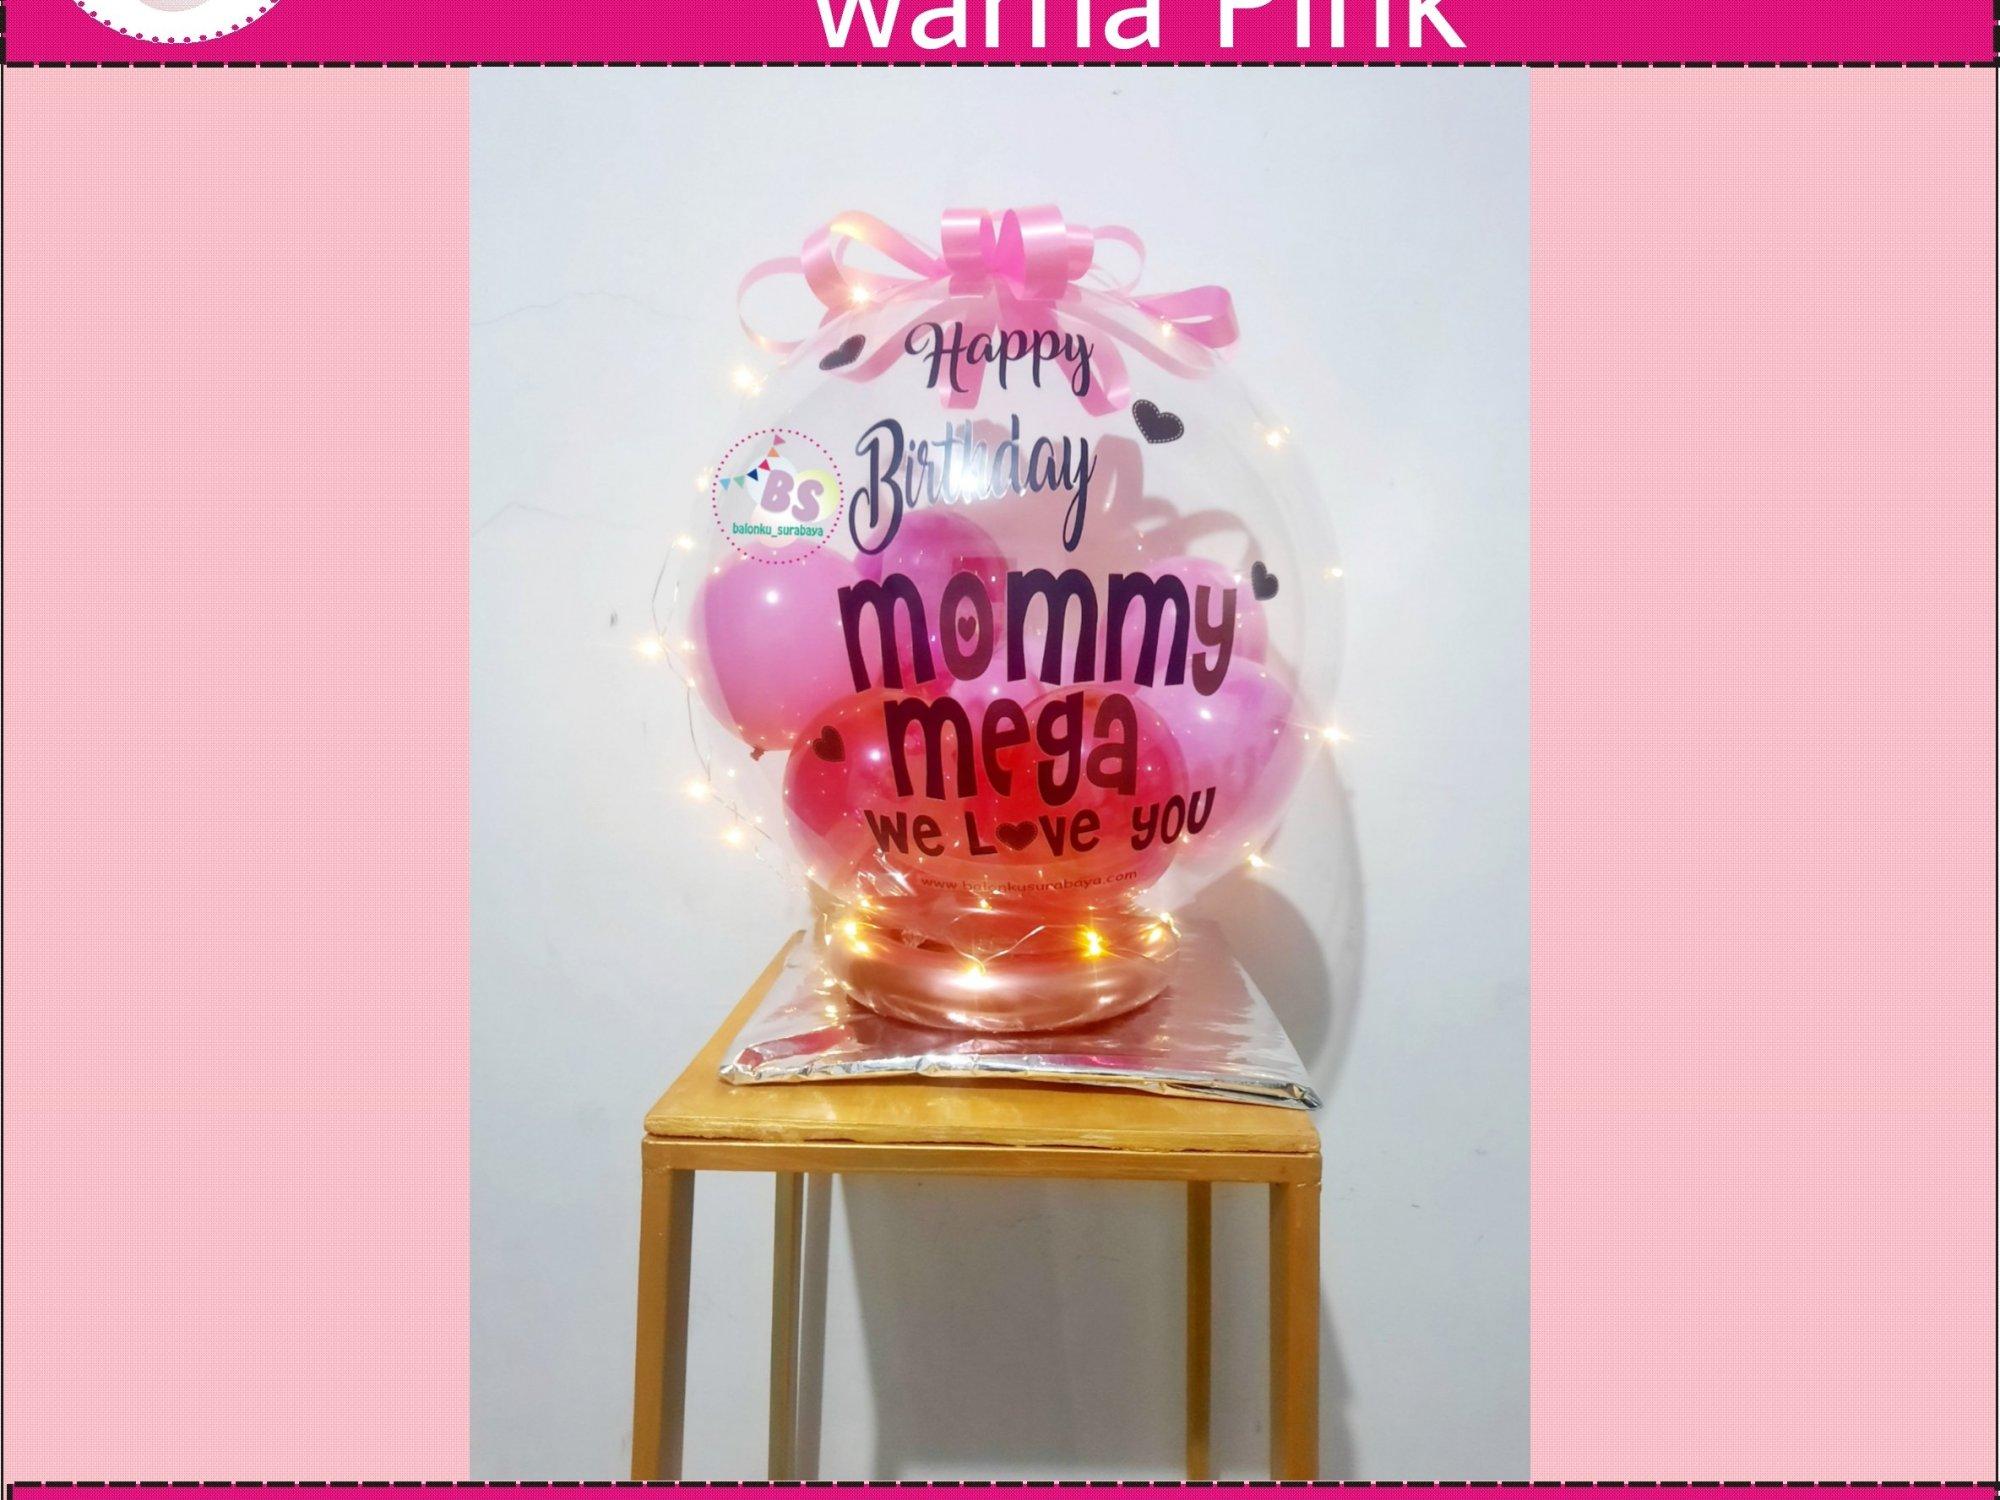 parcel balon ucapan pink, jual balon latex twist hijau emerald, BAlon Gas,Bunga dekorasi,Rangkaian bunga artificial, Buket bunga, buket bunga mawar, harga buket bunga,Balon sablon, balon Printing, balon promosi, Perlengkapan ulang tahun, Balon latex , balon doff, balon natal, balon agustusan, balon dekorasi, balonku Surabaya, 085733133529